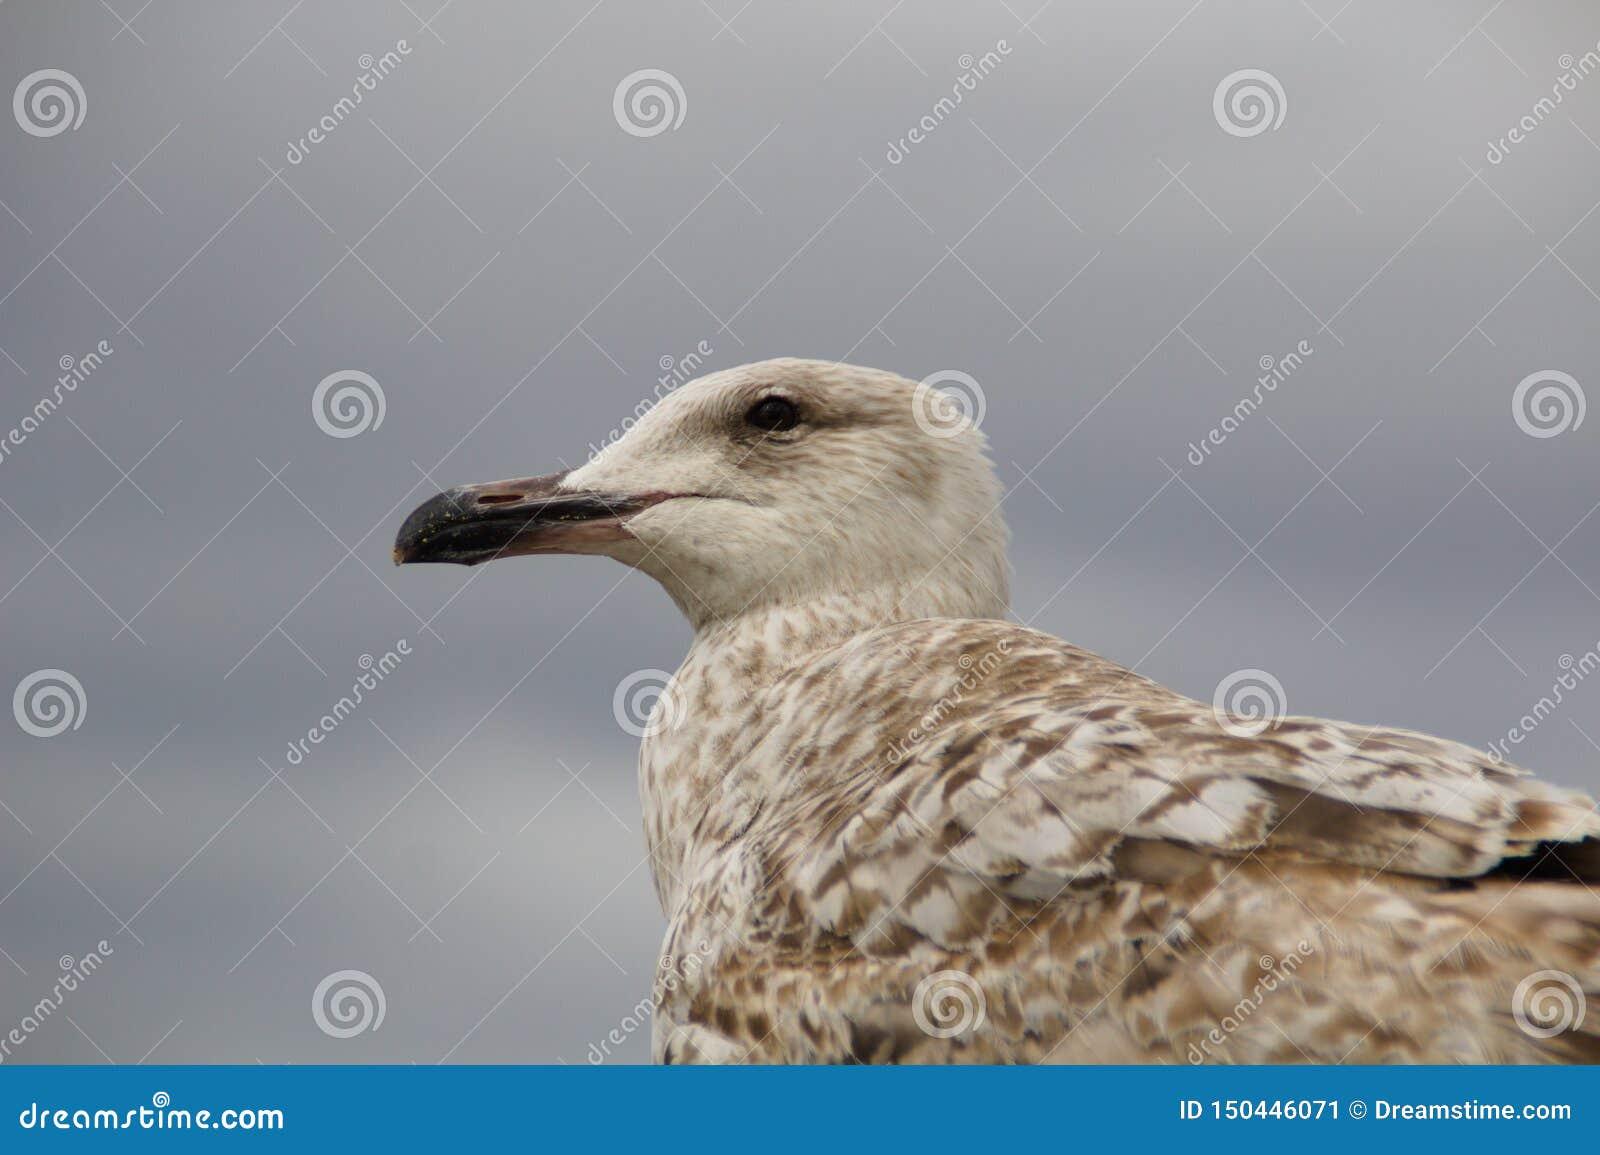 Seagull closeup looking left blurred bg